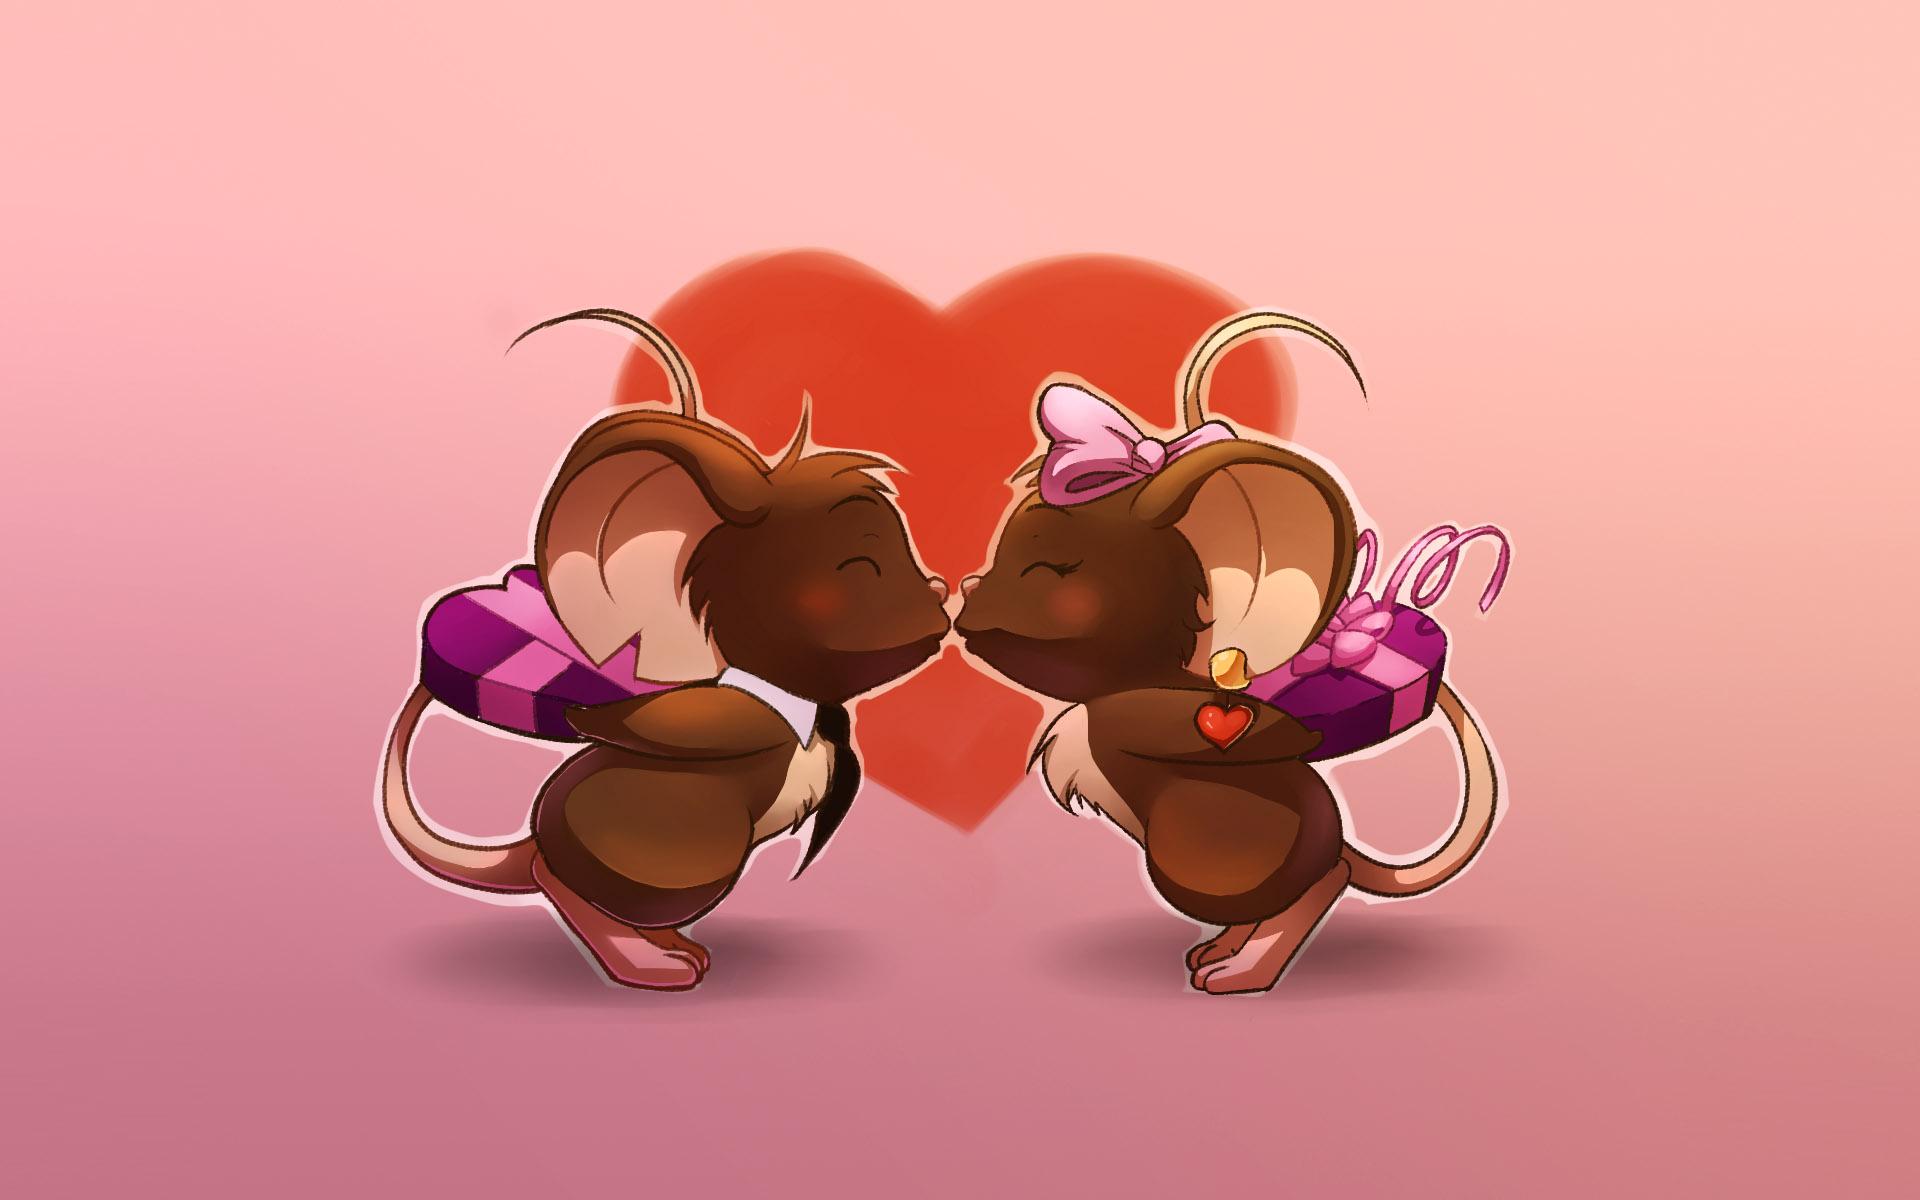 картинки о любви мышки пошло название кара